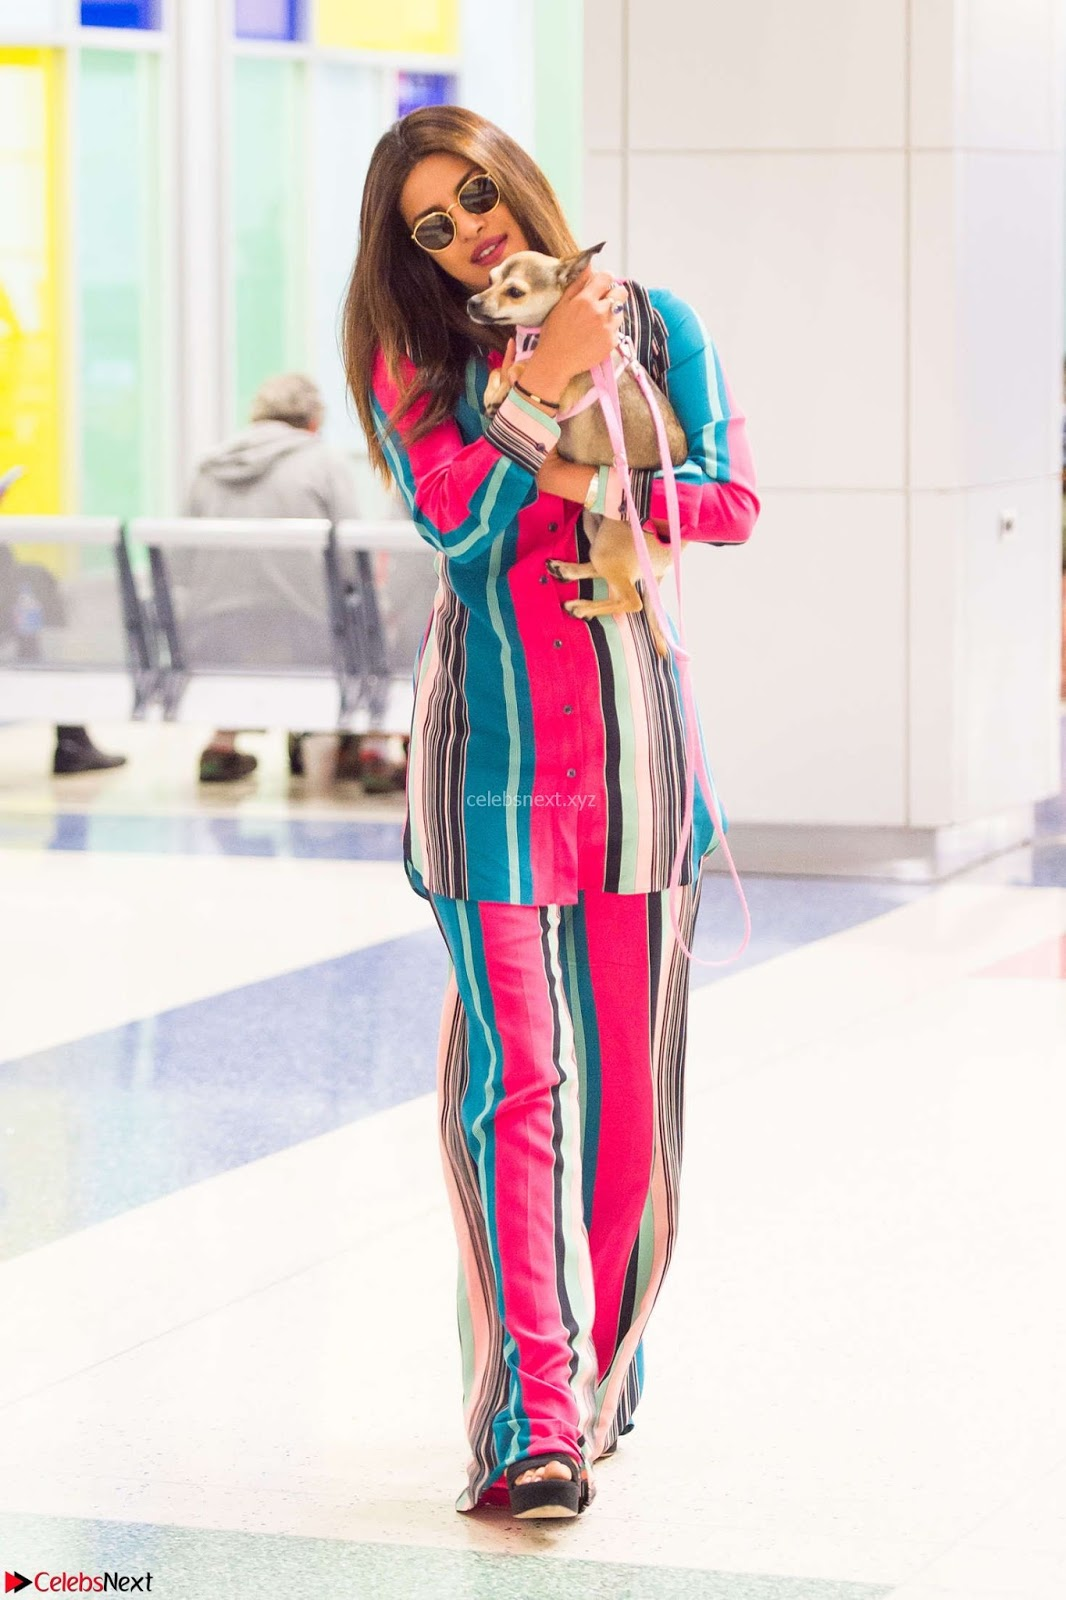 Priyanka Chopra in Colorful Jumpsuit arriving at JFK Airport New York 18 June 2017 ~ CelebsNext Exclusive